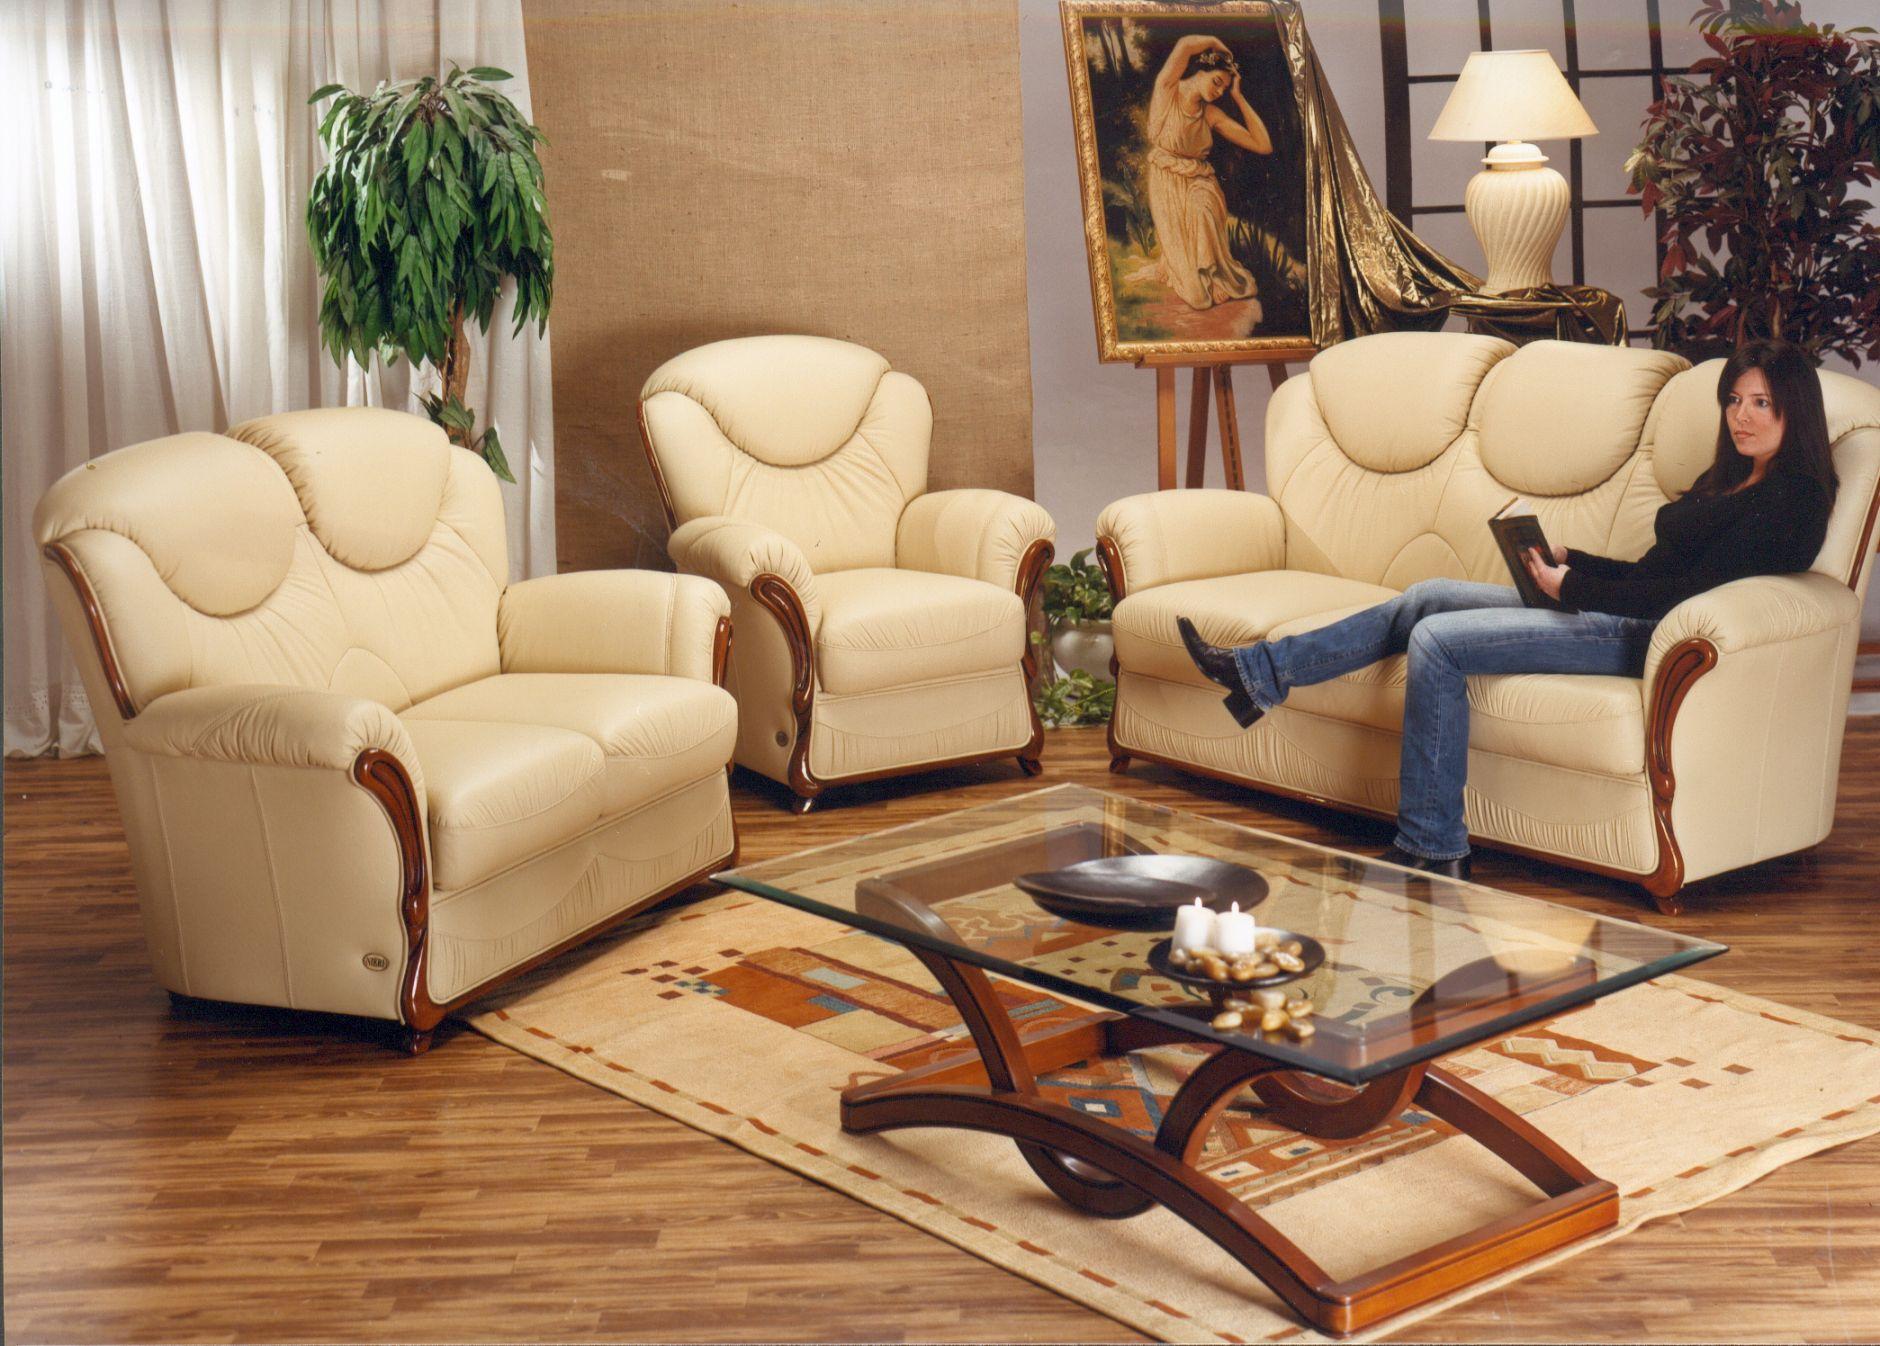 VIP-sofas - VIP-Sofas Nieri Divani ELENA ModellDie Möbel aus Italien